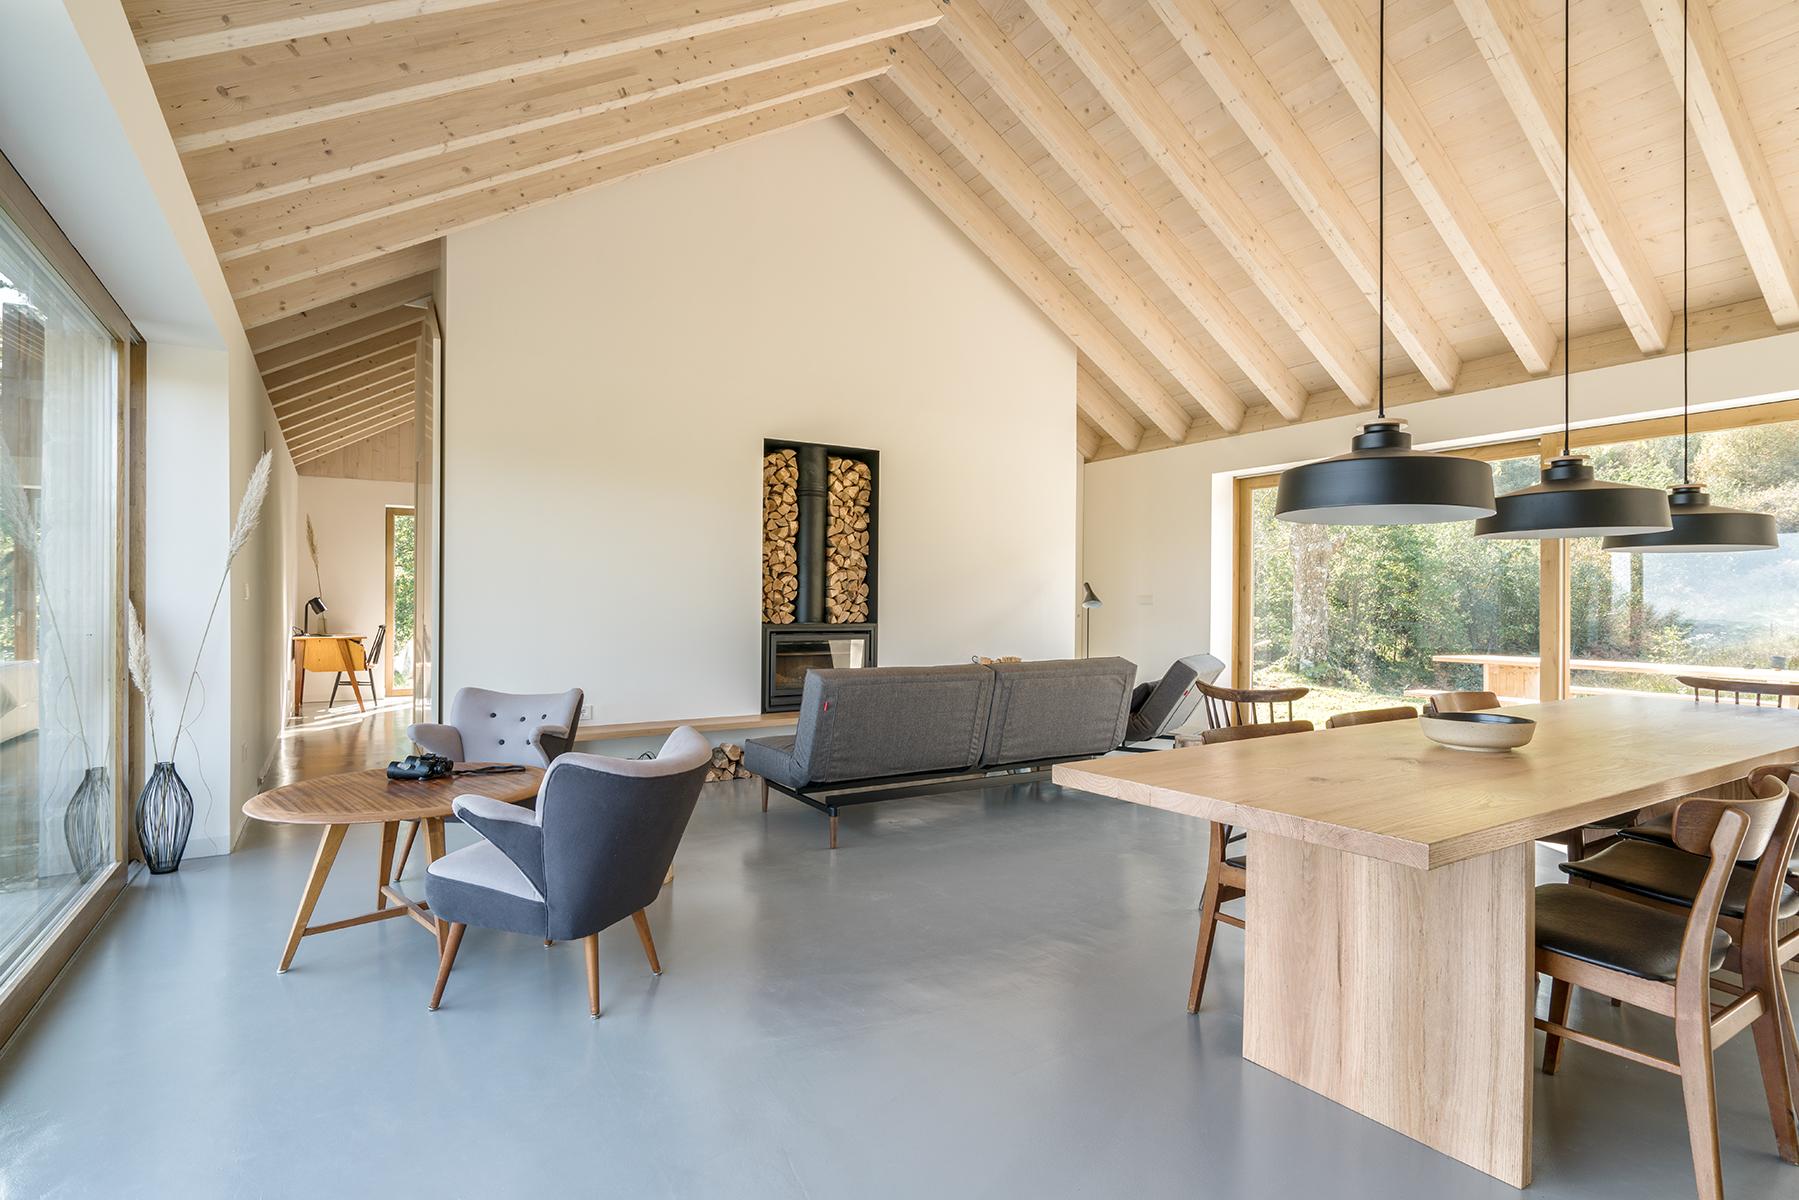 villa-slow-holiday-retreat-valles-pasiegos-david-montero-laura-alvarez-architecture-09